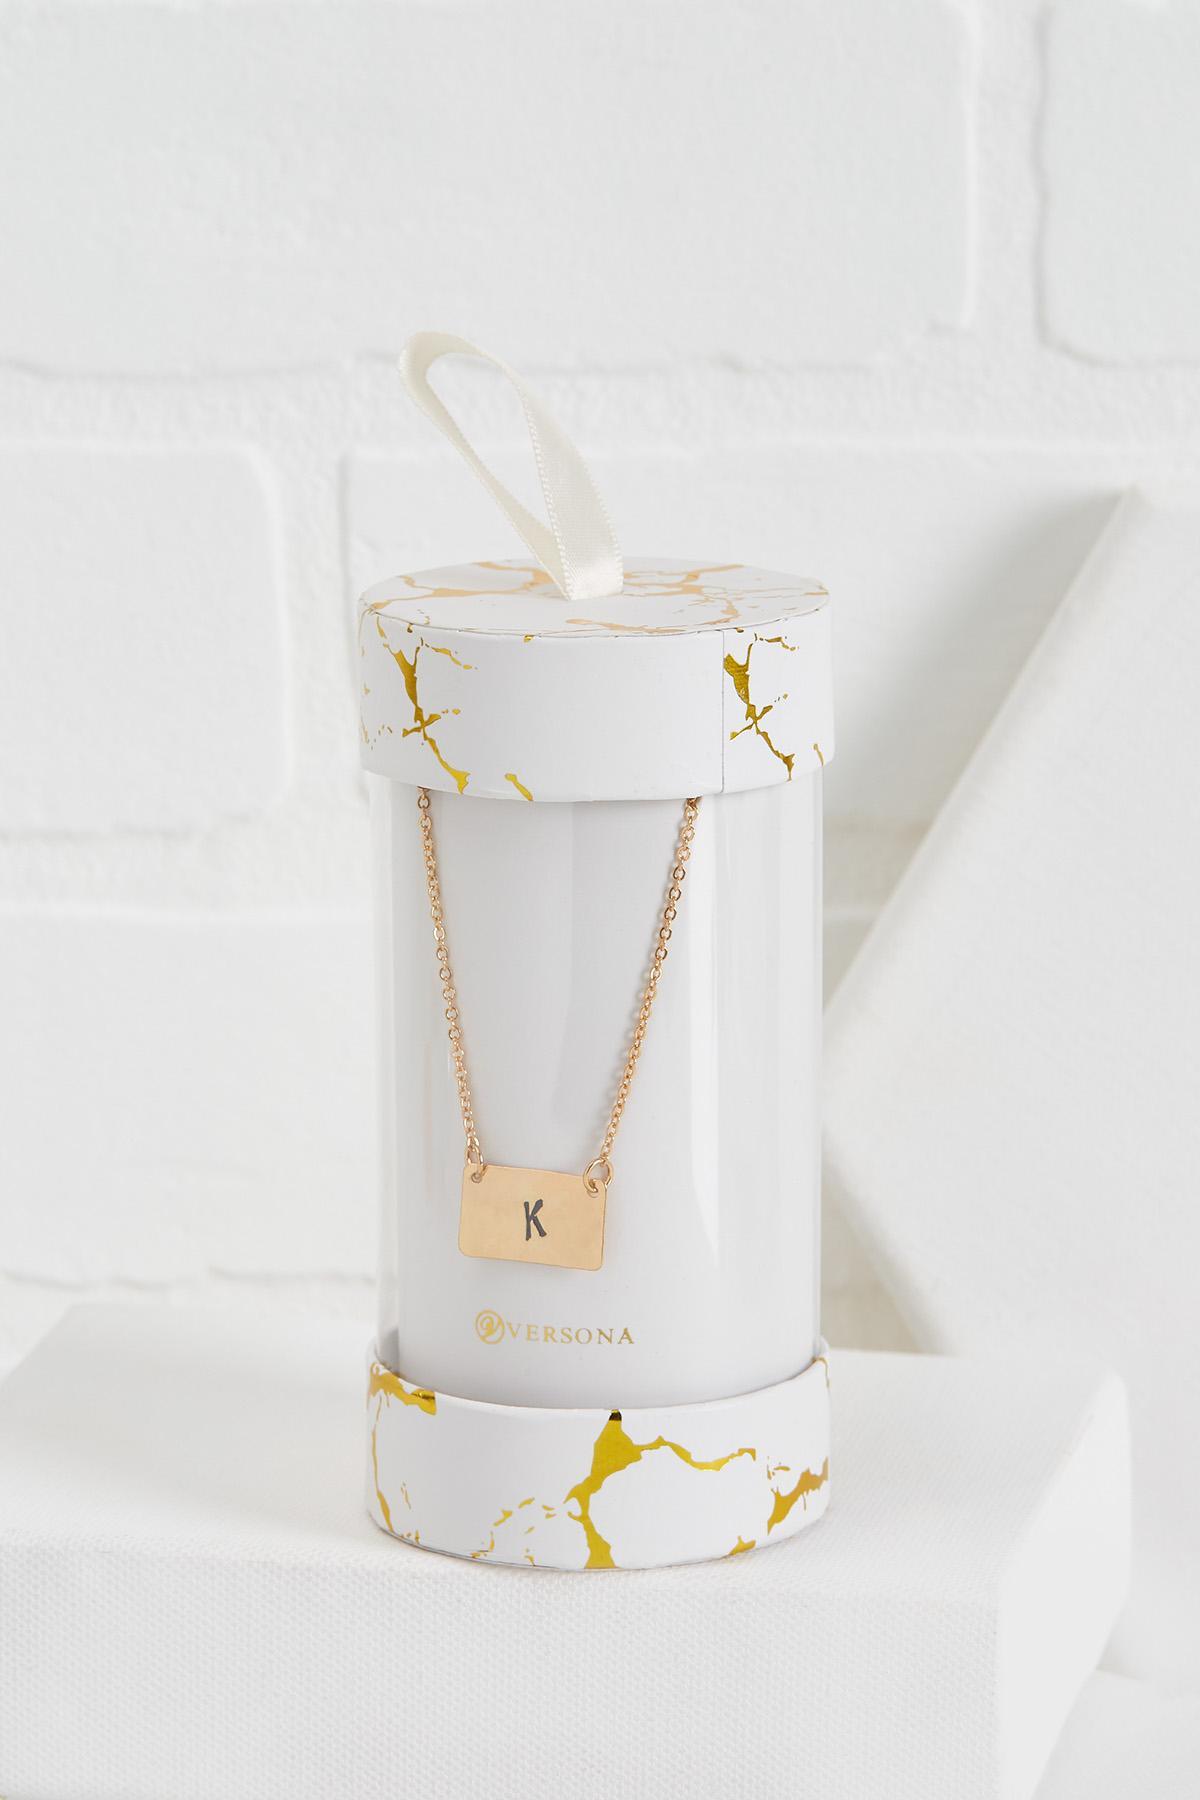 K Initial Pendant Necklace